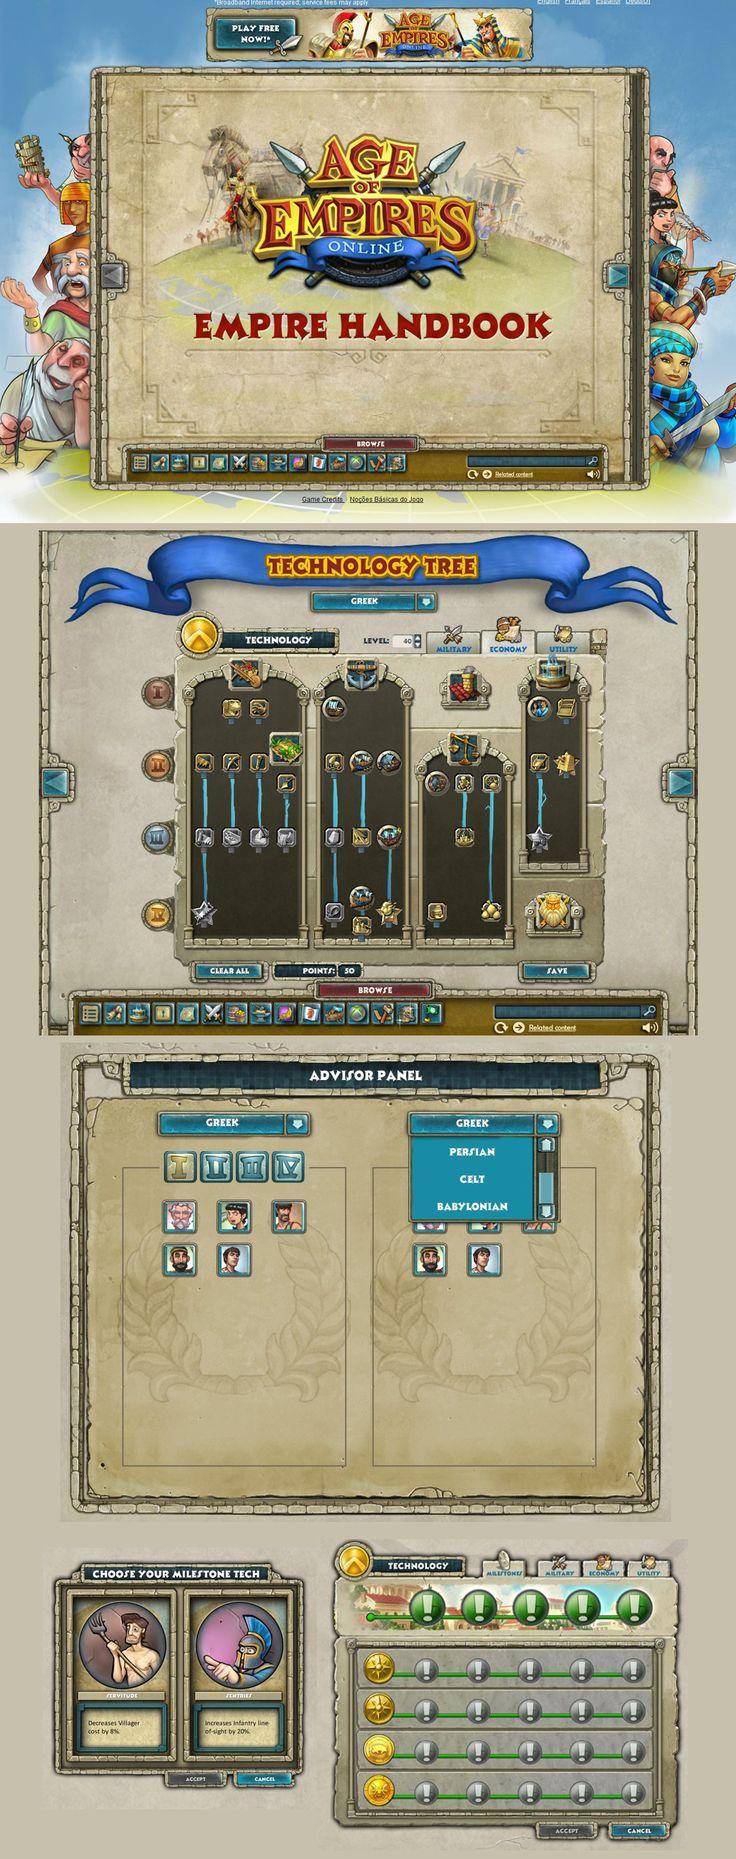 age of empires interface of empire handbook